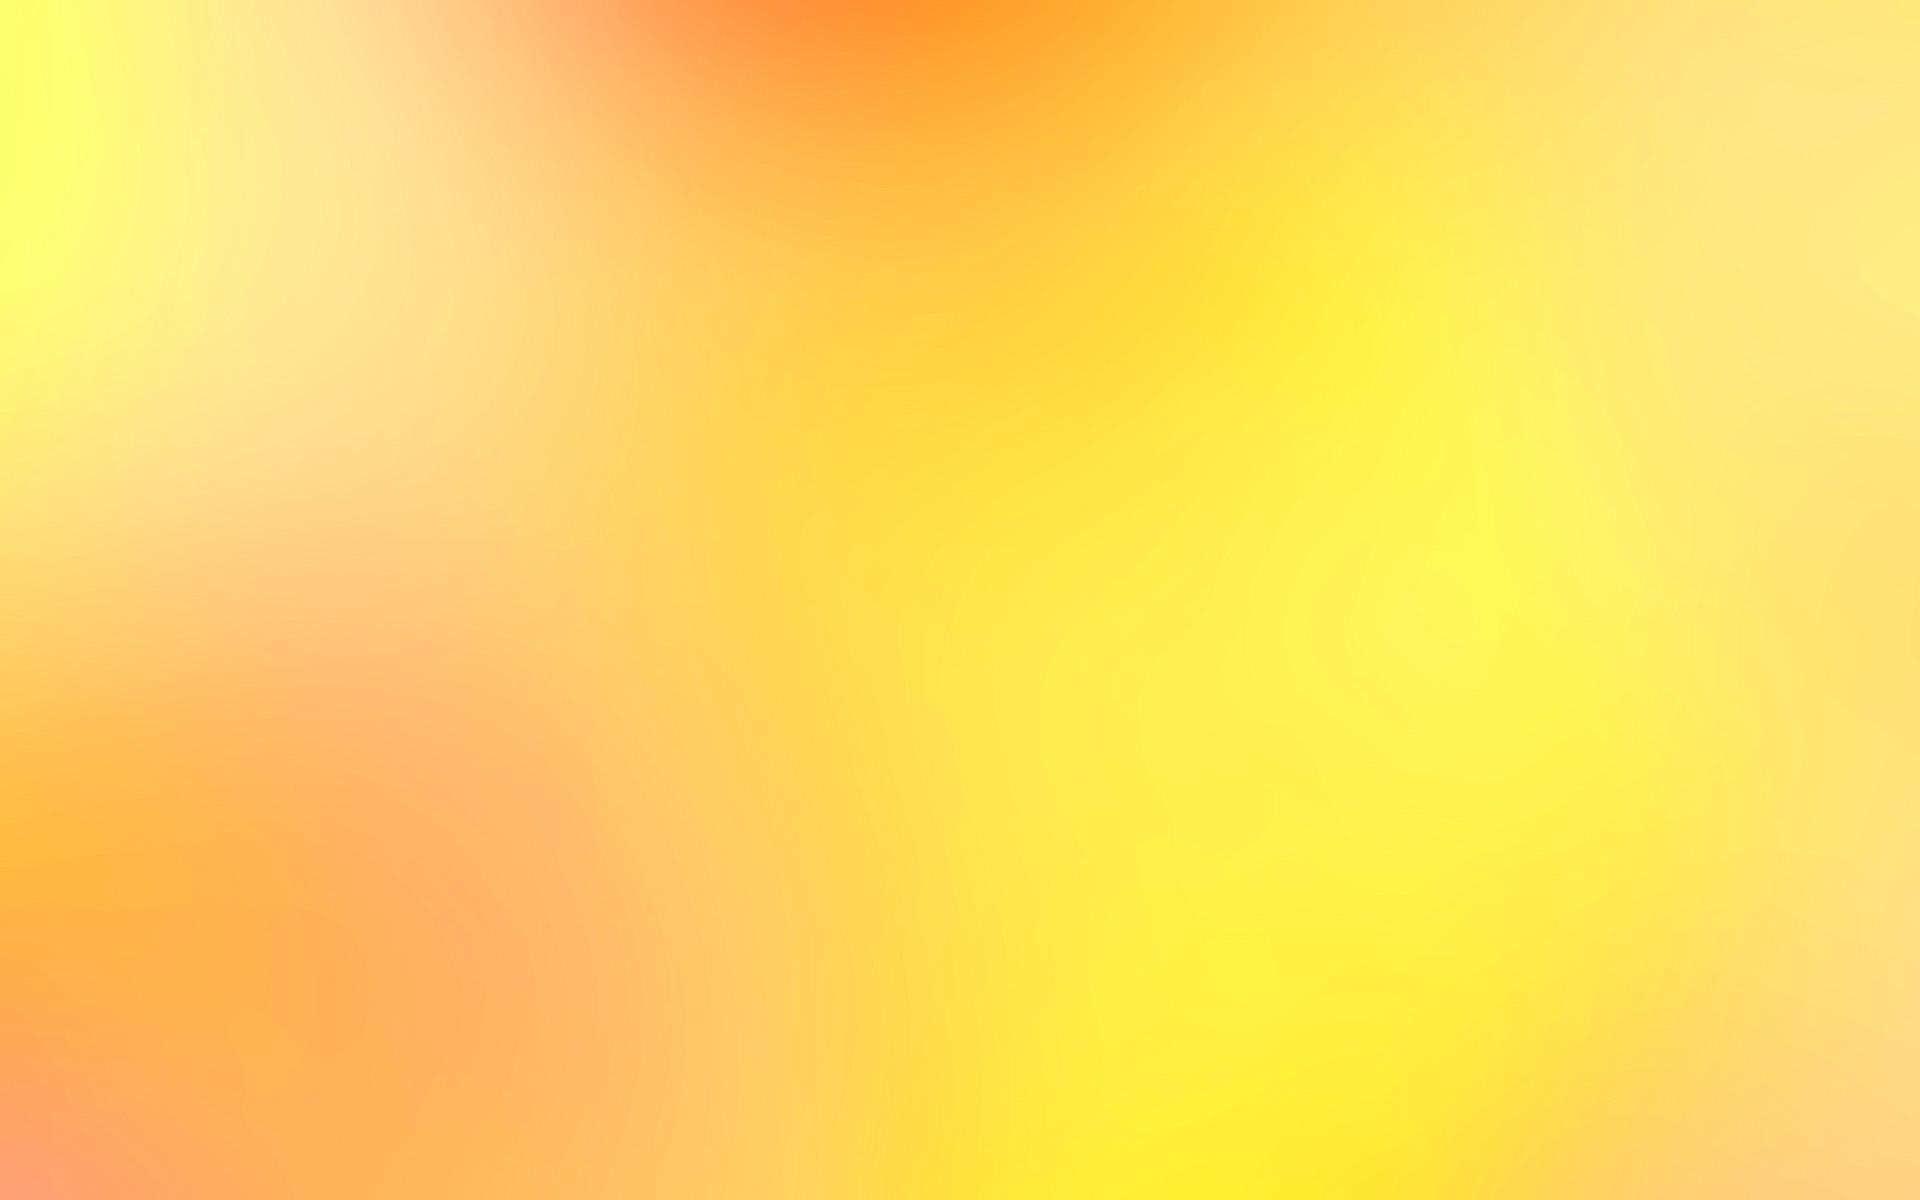 Yellow--blur-background